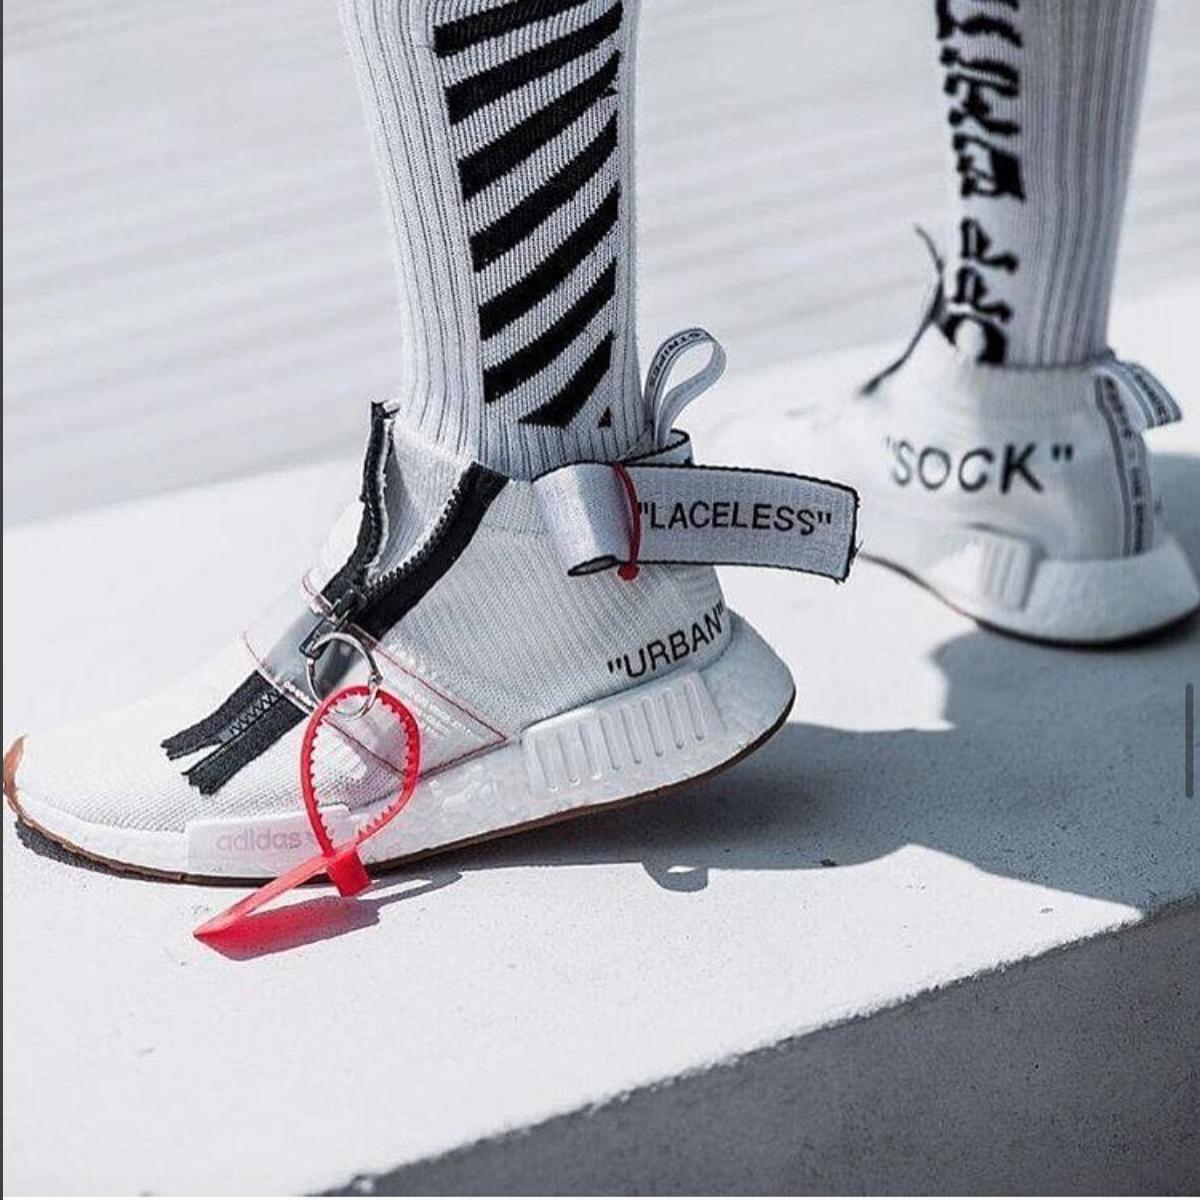 11924e8208 Adidas Custom Laceless  sneakers  sneakernews  StreetStyle  Kicks  adidas   nike  vans  newbalance  puma  ADIDAS  ASICS  CONVERSE  DIADORA  REEBOK   SAUCONY